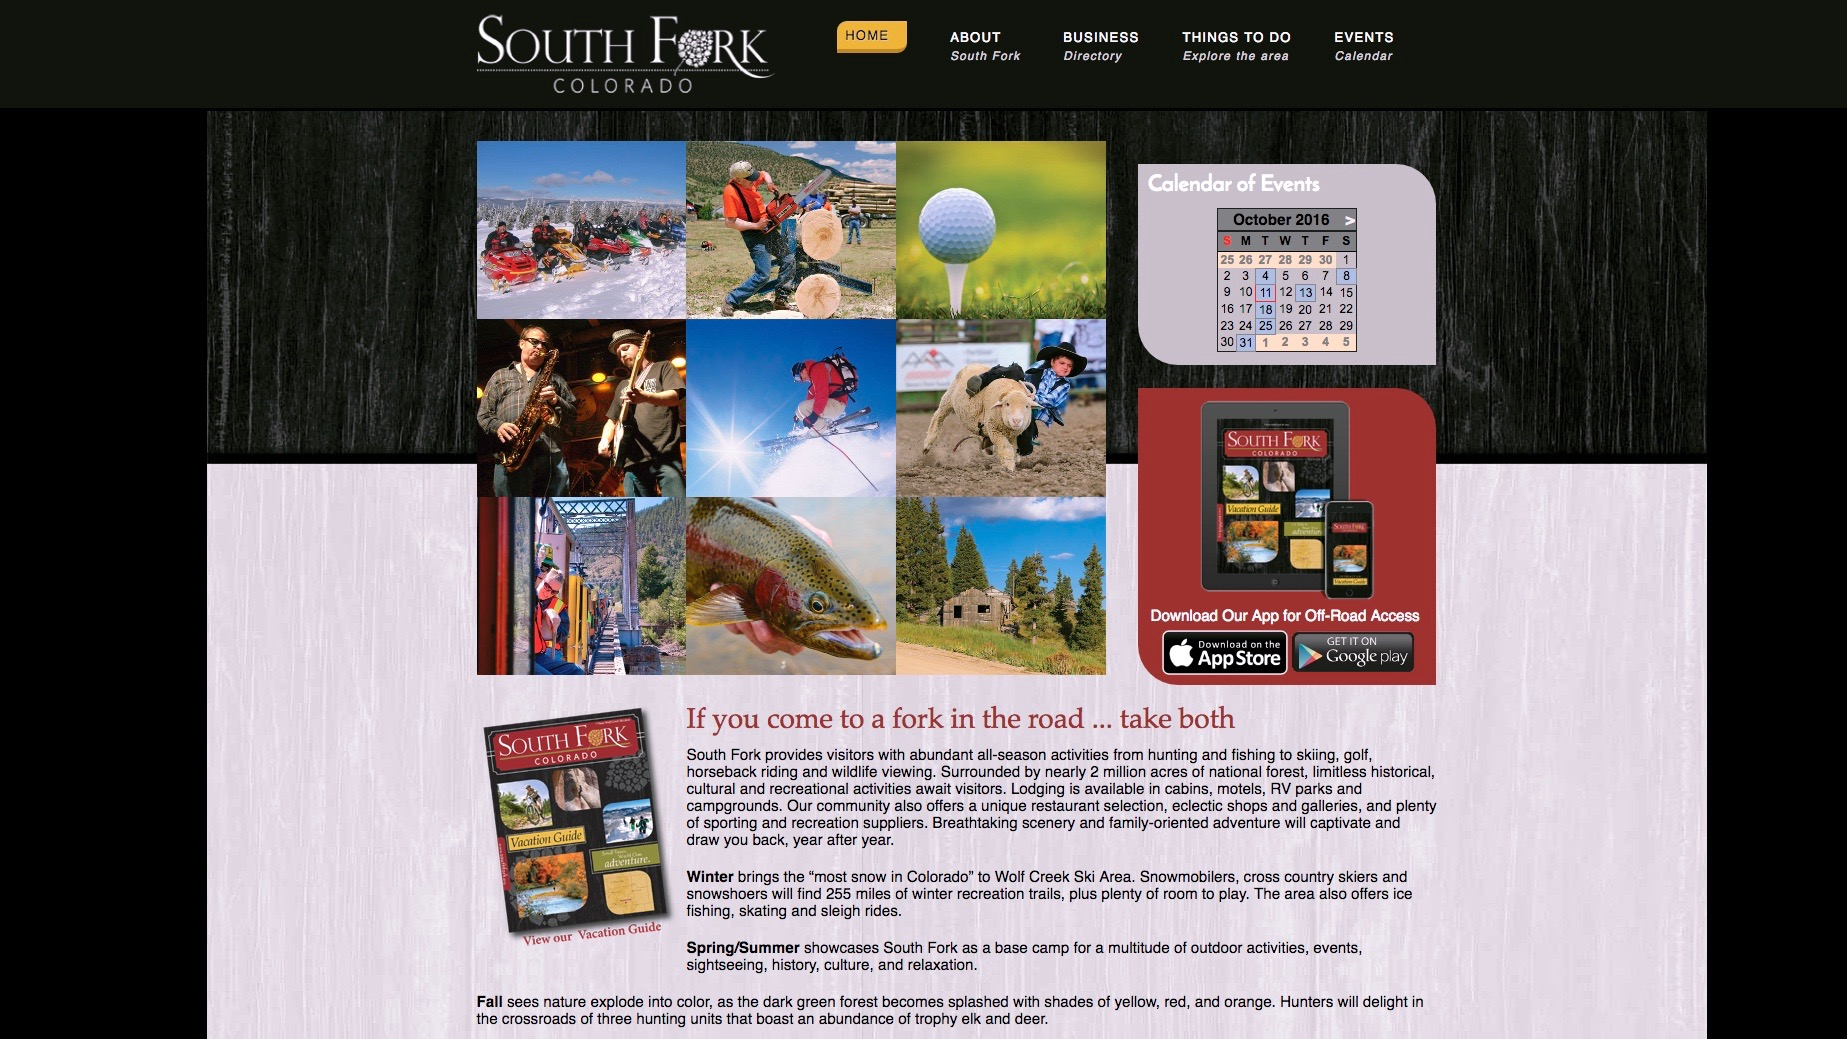 City of South Fork website